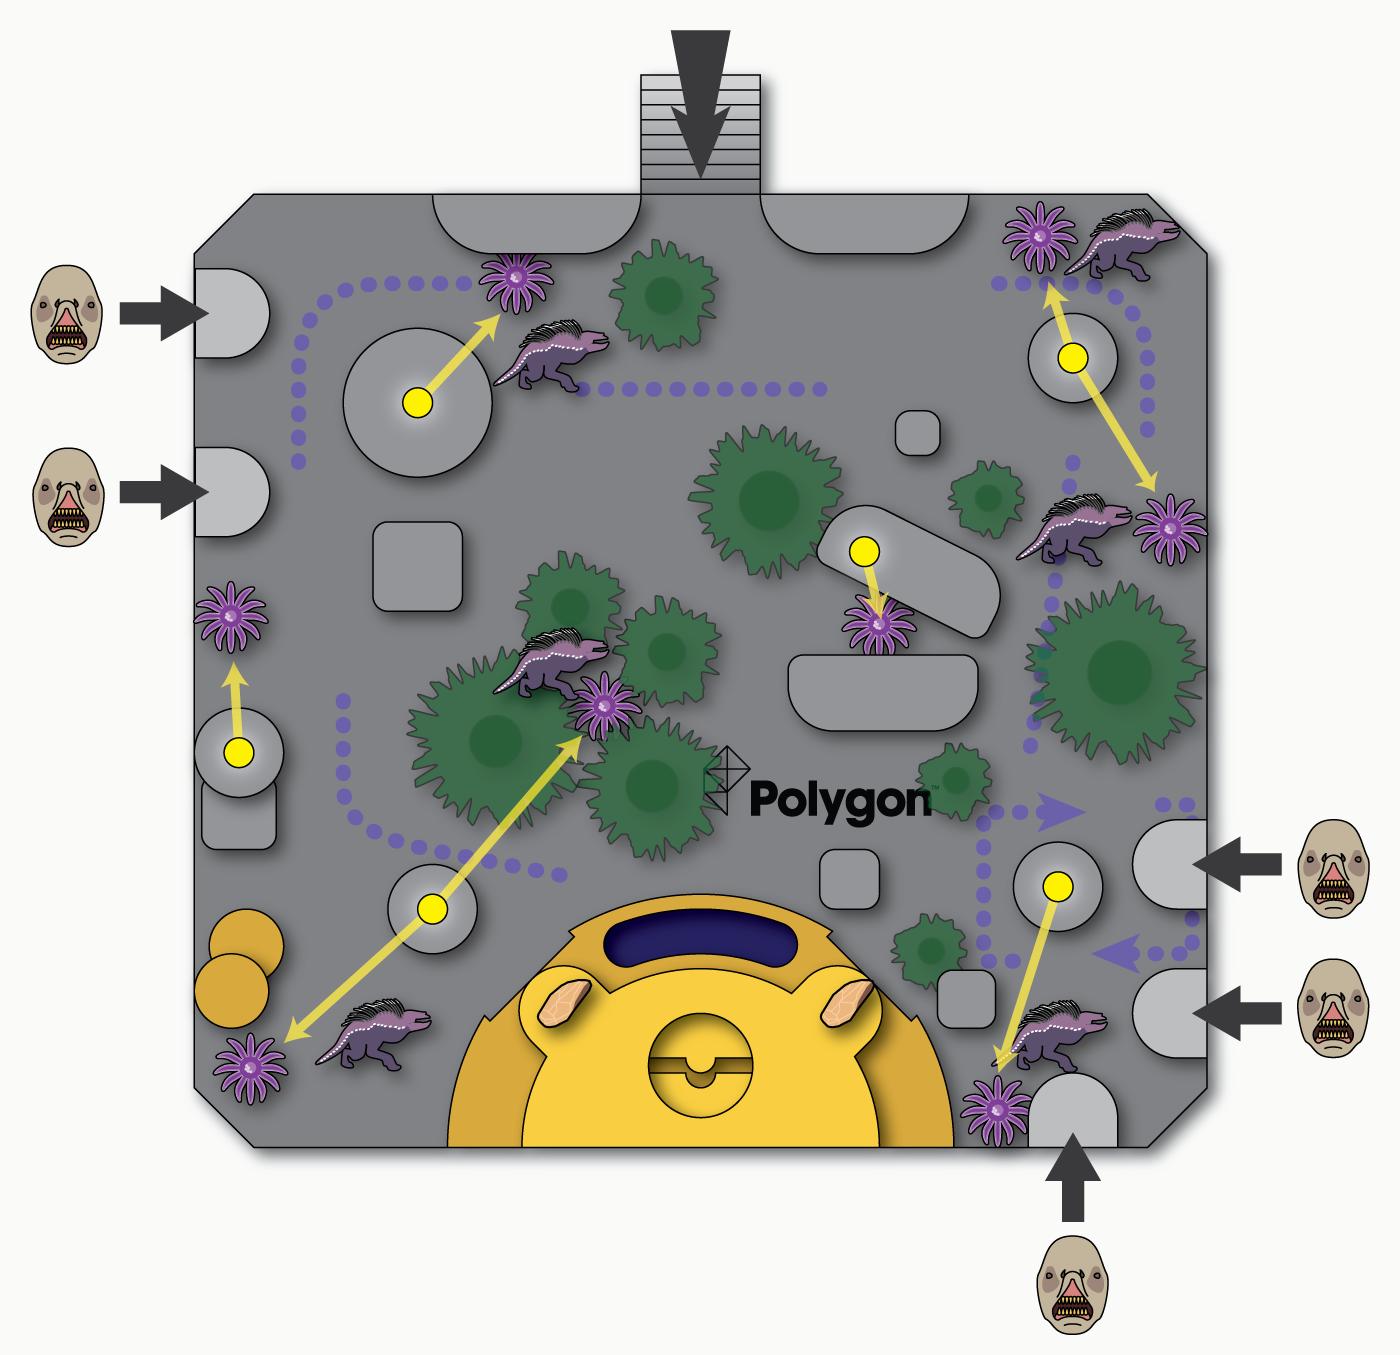 destiny 2 leviathan raid guide pleasure gardens polygon